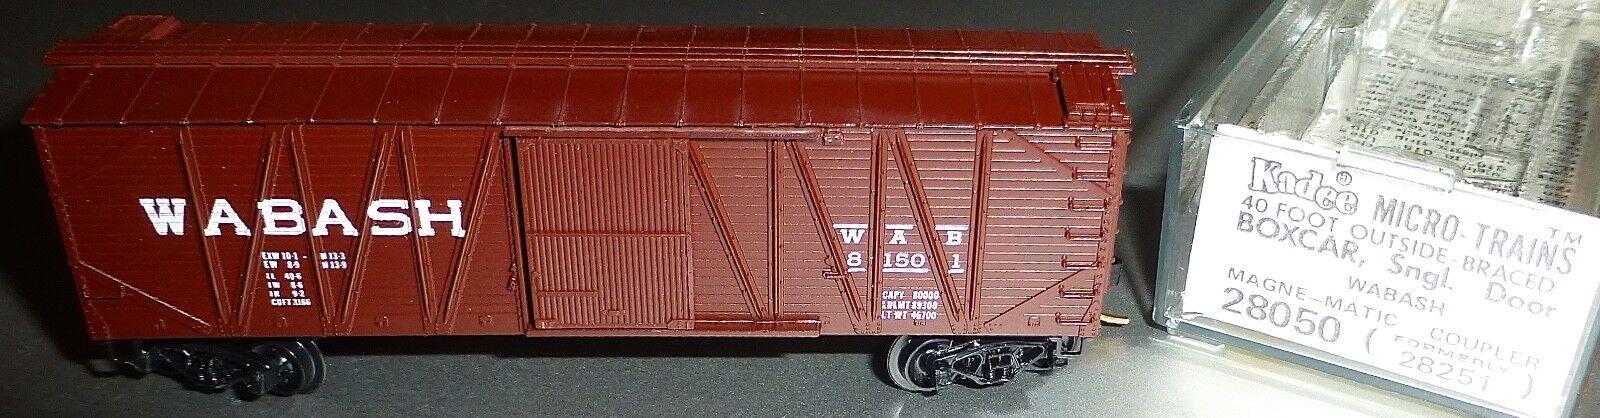 40´ Outside Braced Boxcar WABASH 81501 Micro Trains Line 28050 n 1 160 c å